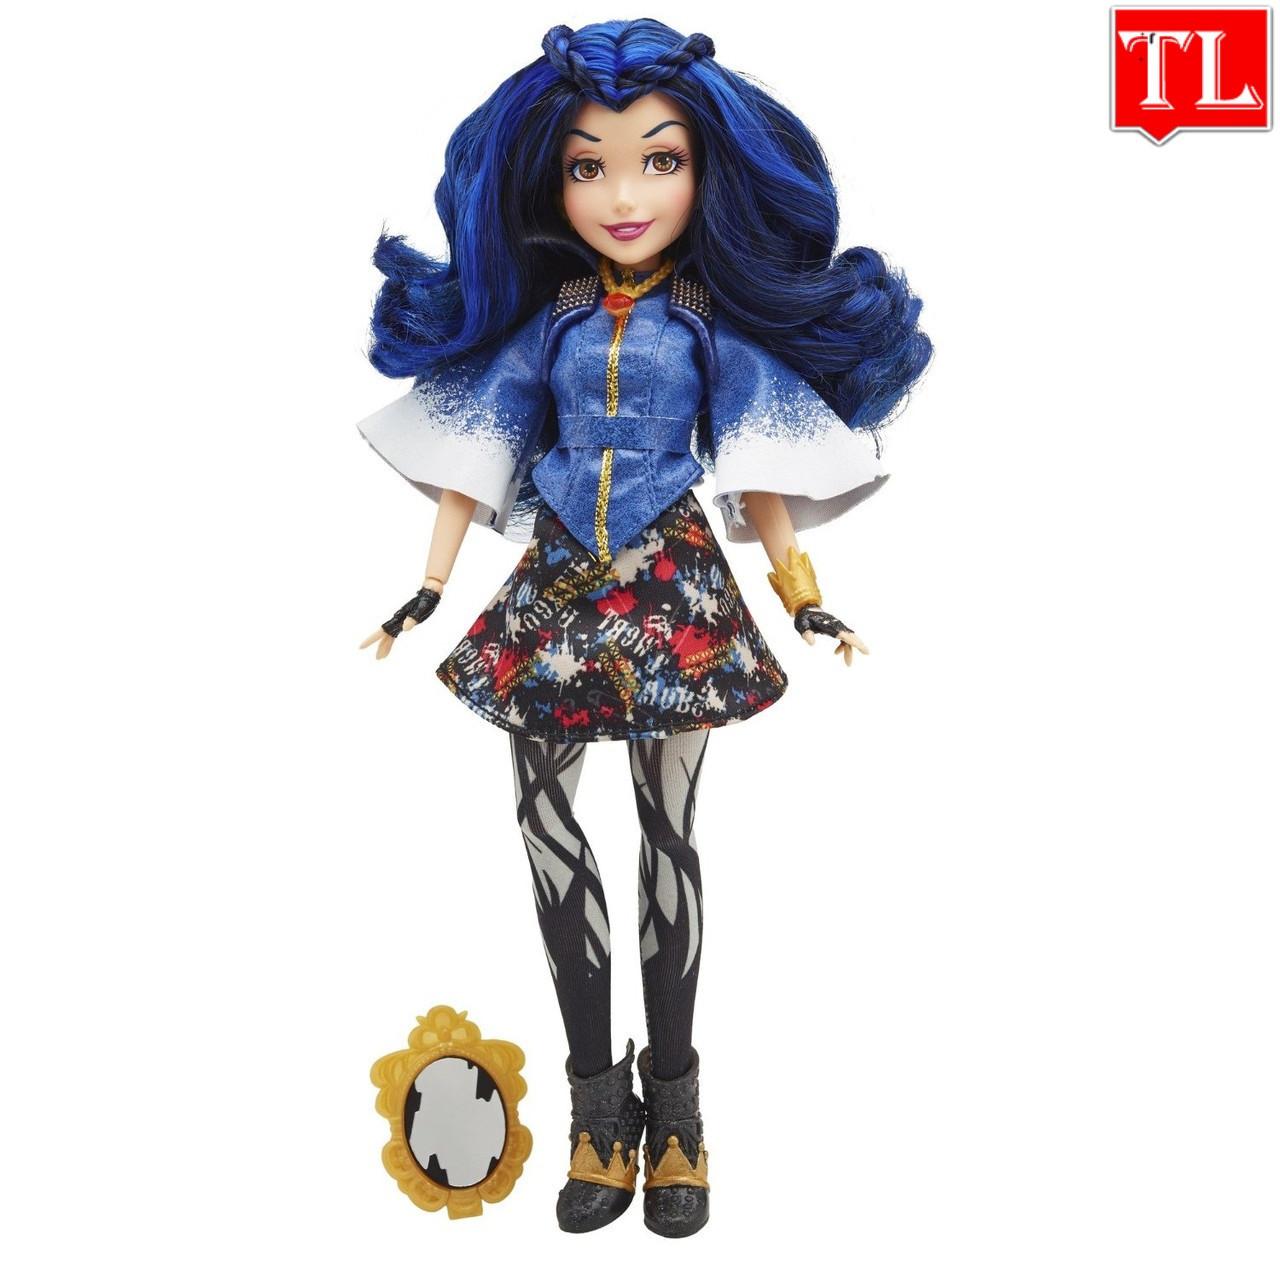 Лялька Спадкоємці Дісней Еві / Disney Descendants Villain Descendants Signature Evie